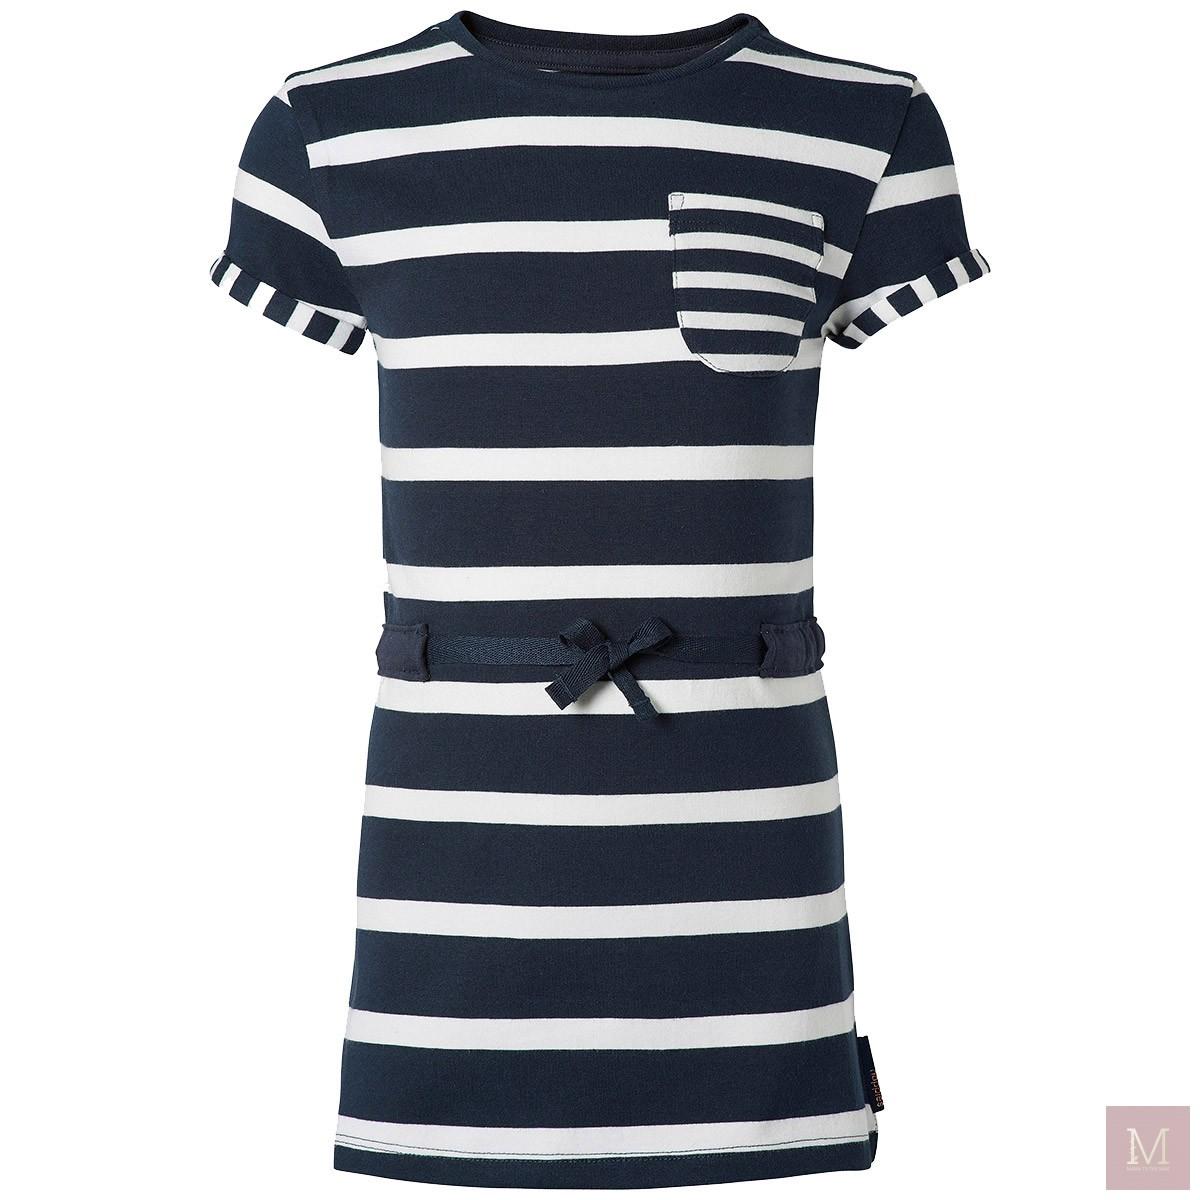 zomerjurkje Noppies, favoriete kledingmerken, kleertjes.com